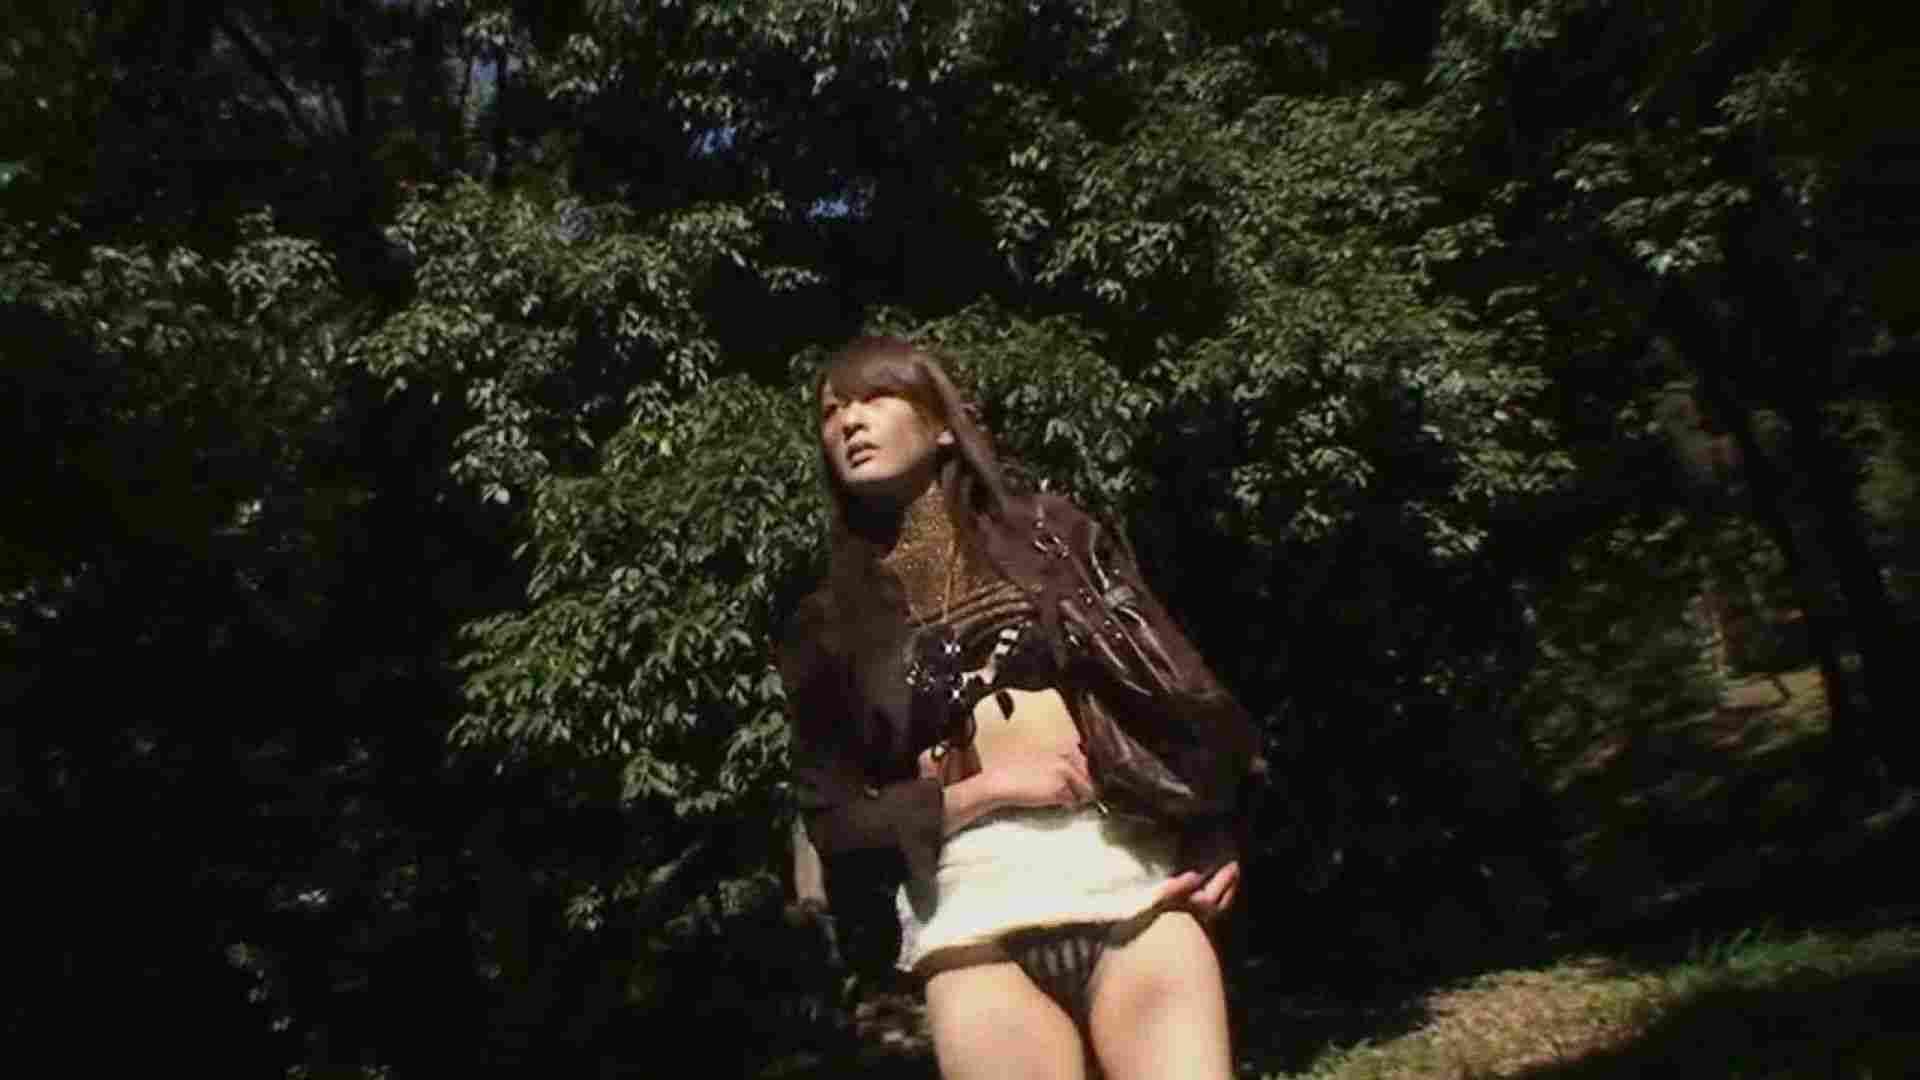 S級厳選美女ビッチガールVol.03 ナース 覗き性交動画流出 80画像 23